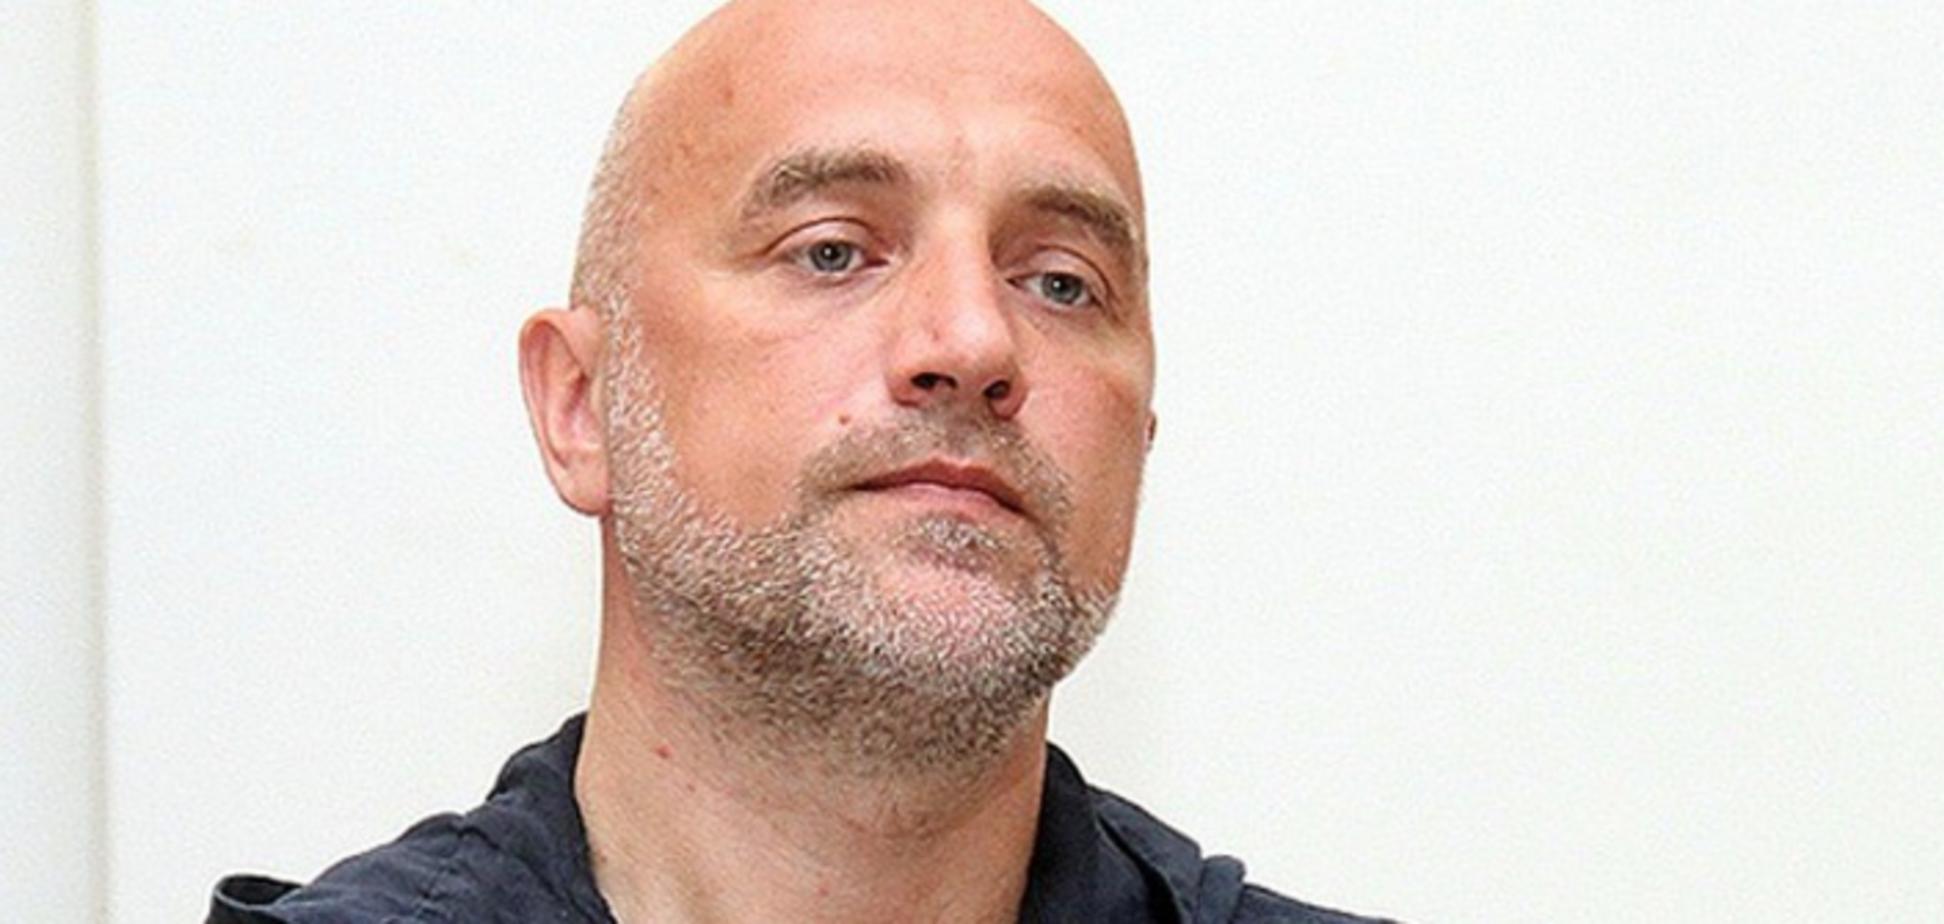 ''Хочу повернутися'': письменник-терорист задумав другий похід у ''ДНР''